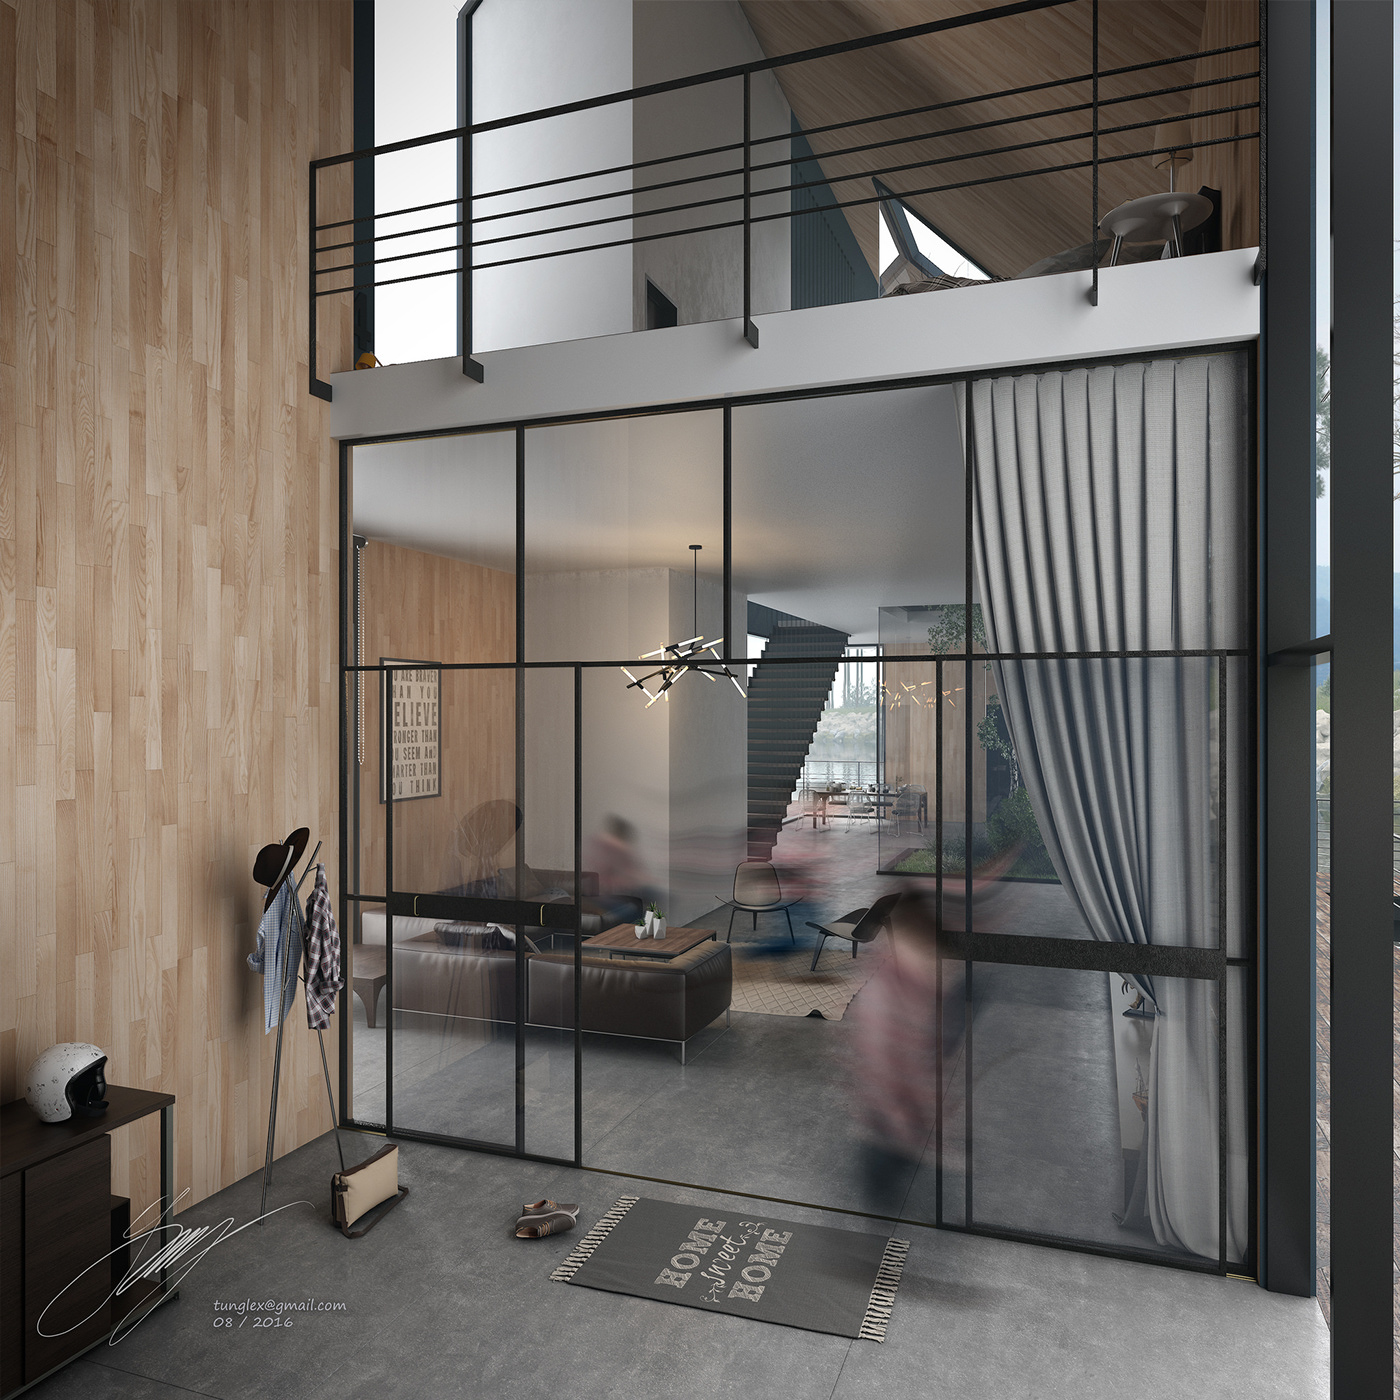 lakehouse 3dsmax Render vray Visualise architecture visualiser foggy swan